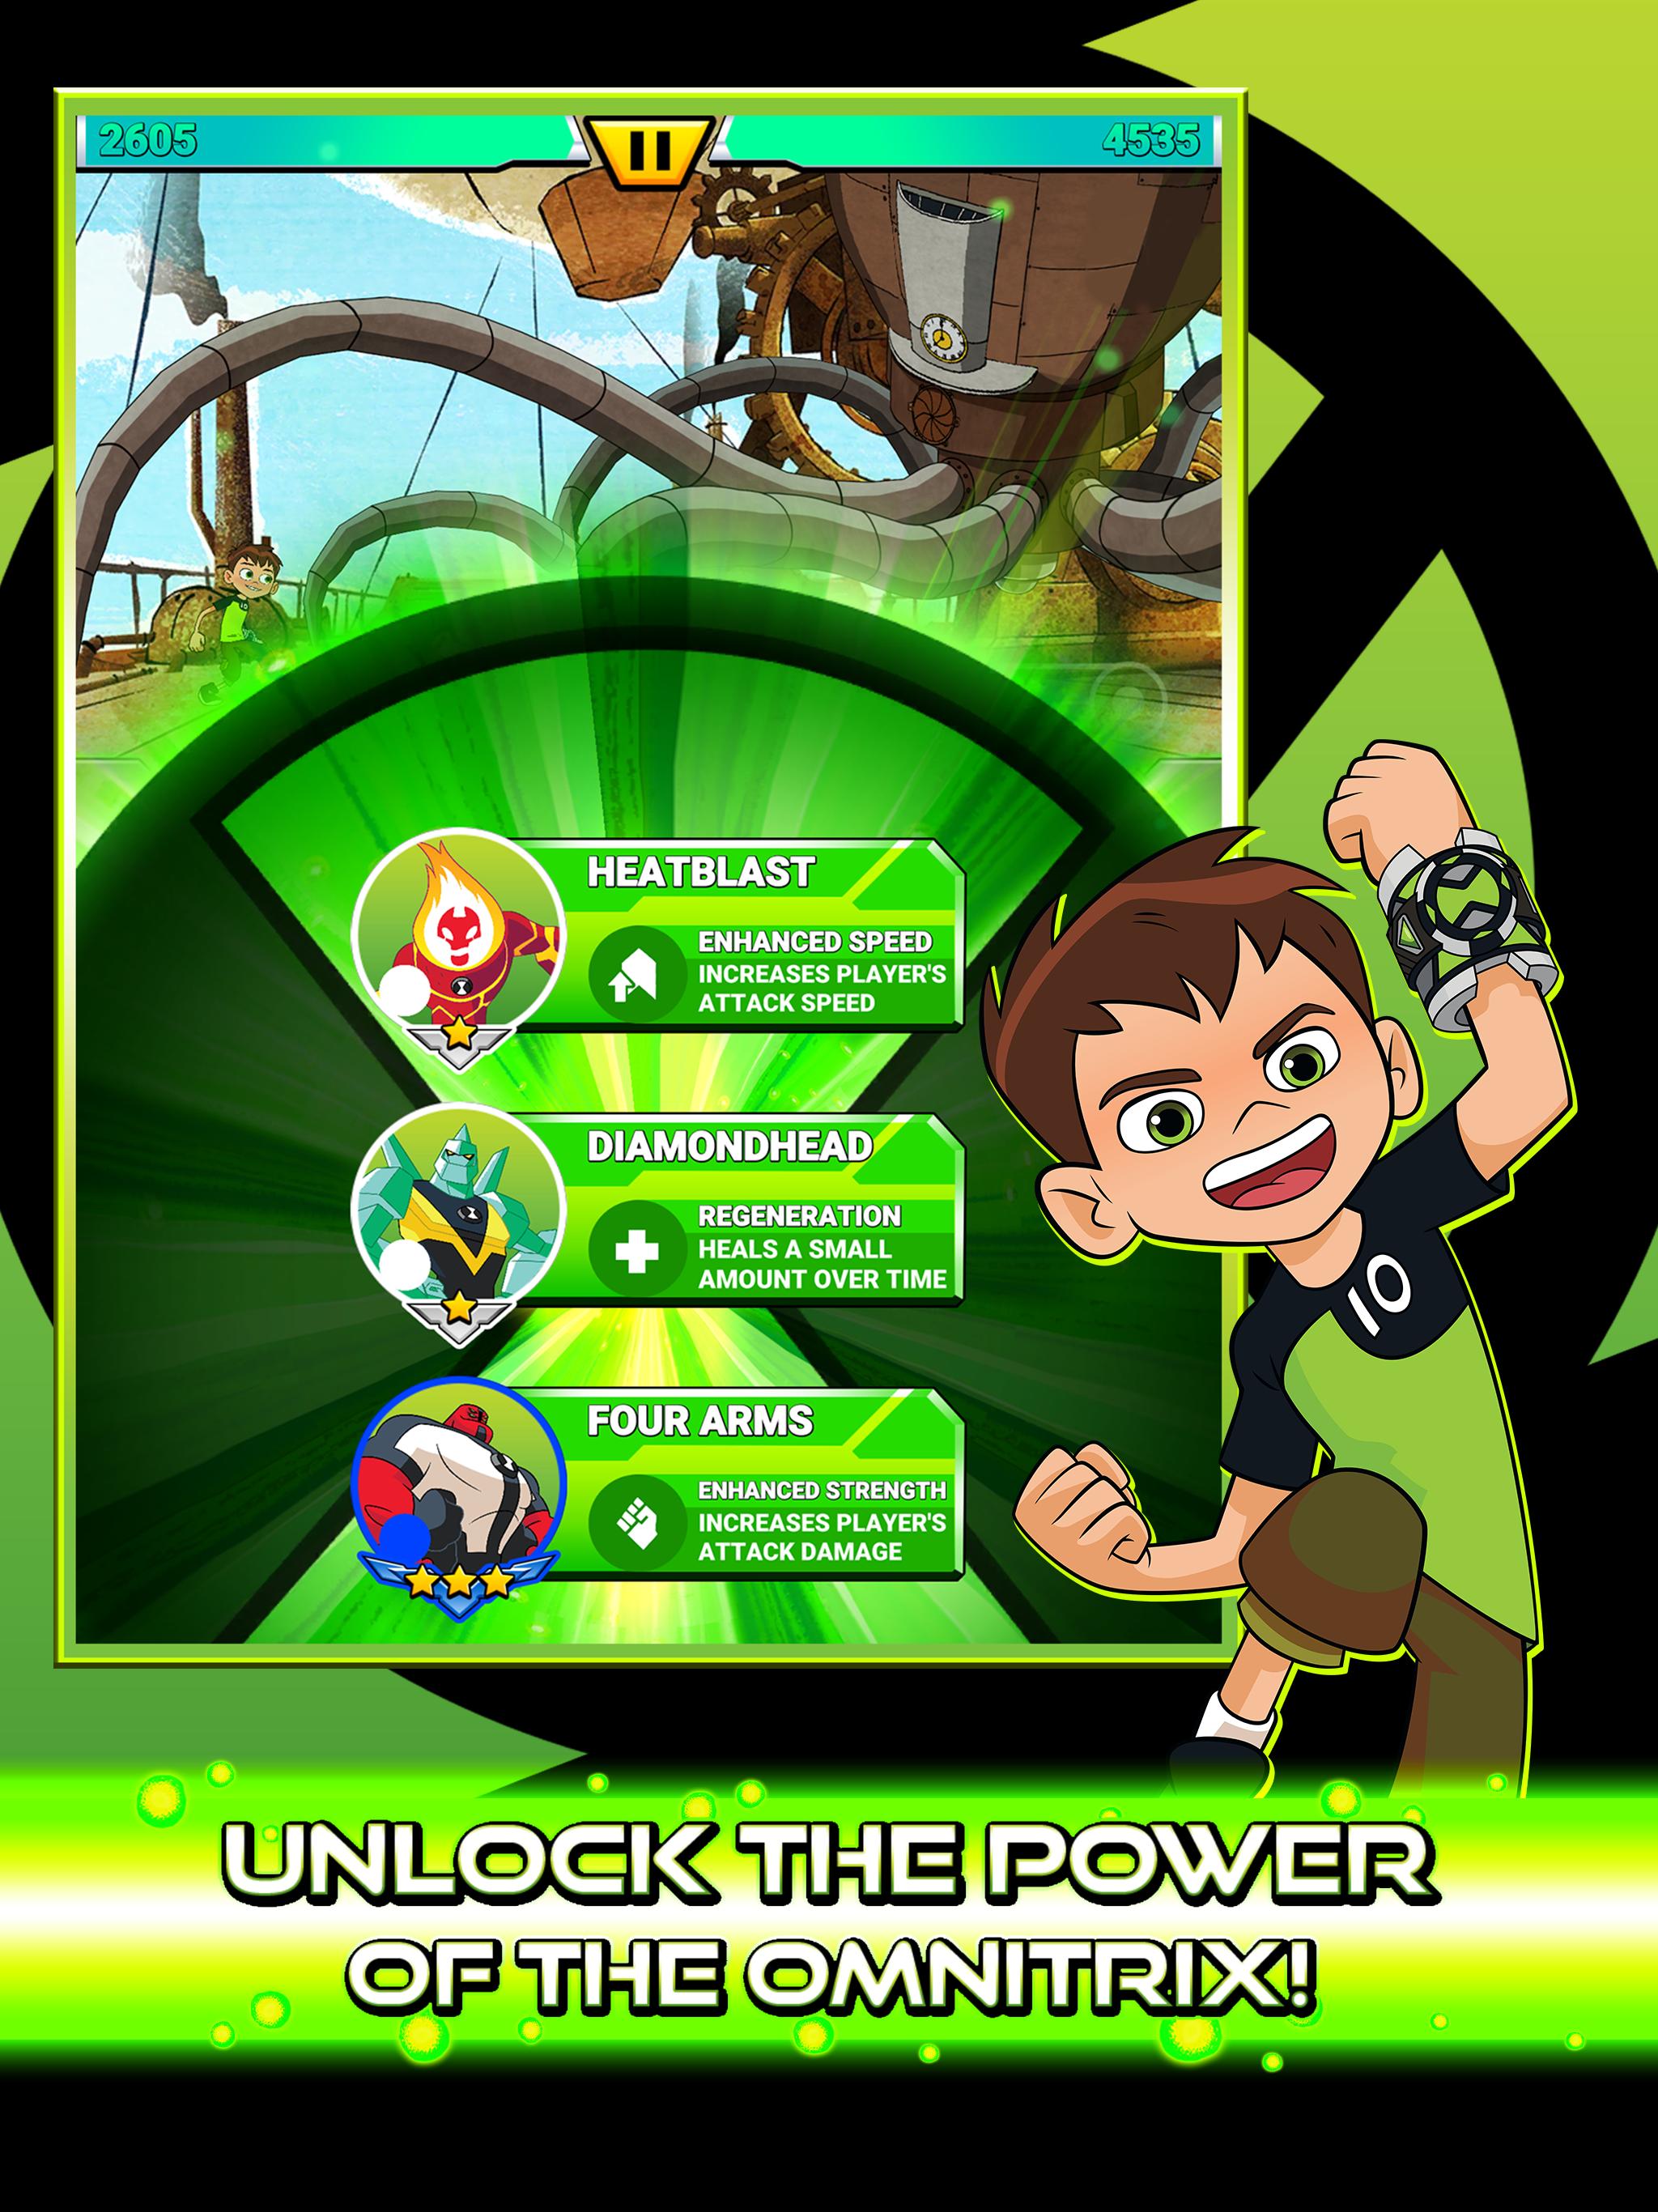 screen_unlock_power_of_omnitrix.png